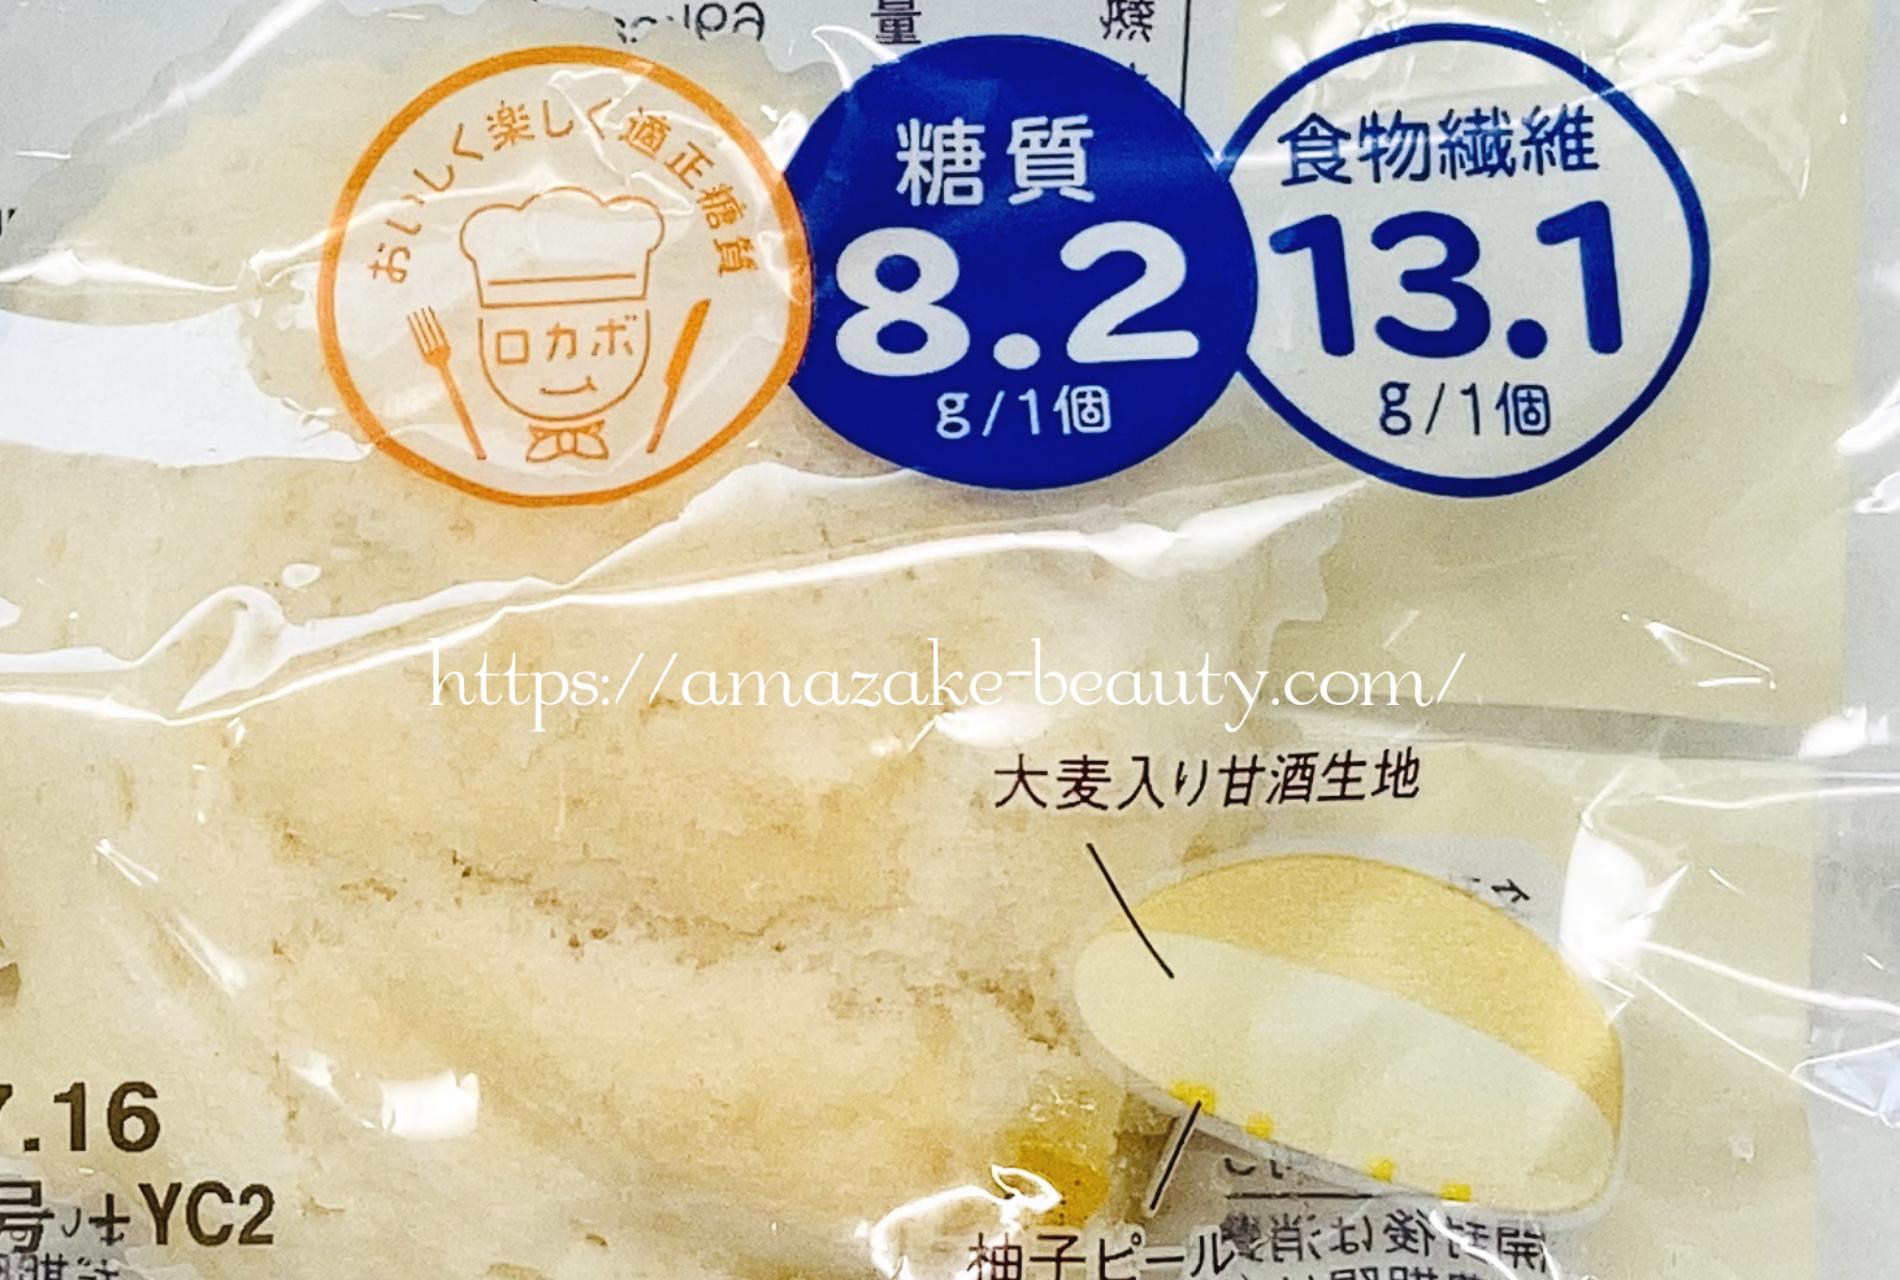 [amazake swets]lawson[omugi no mushipan amazake to yuzu](description)